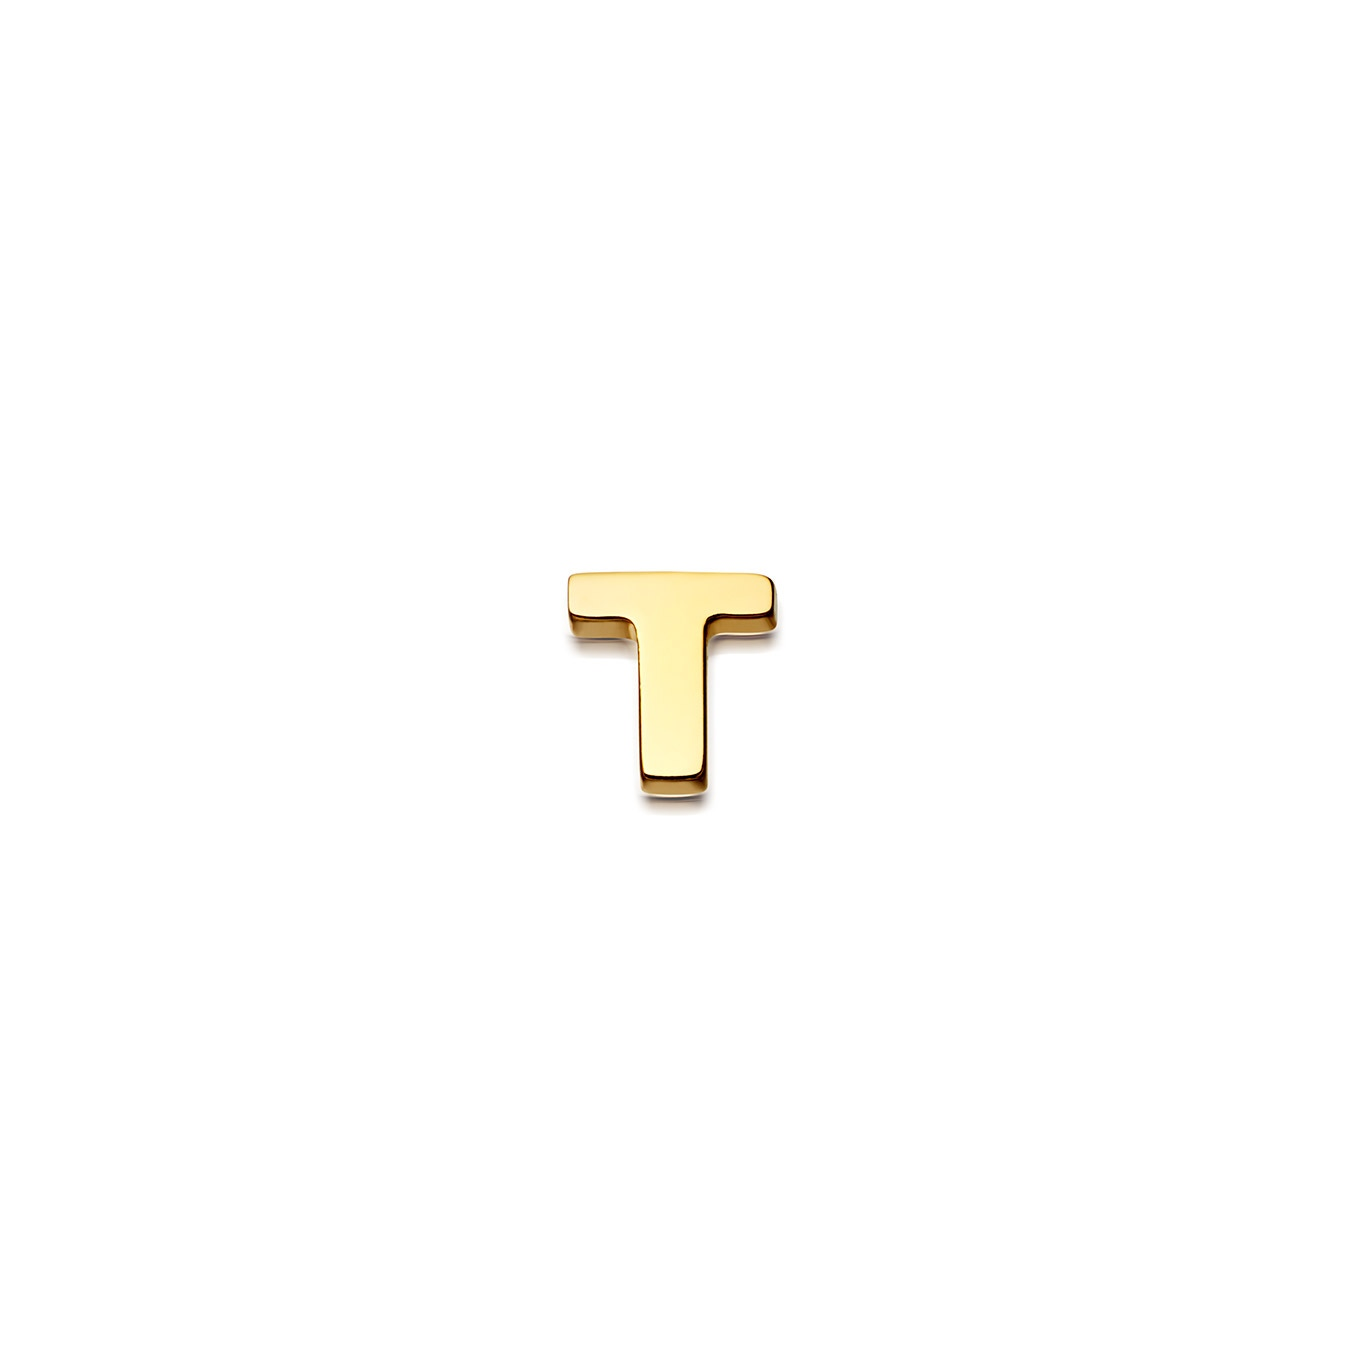 Initial 'T' Biography Pin